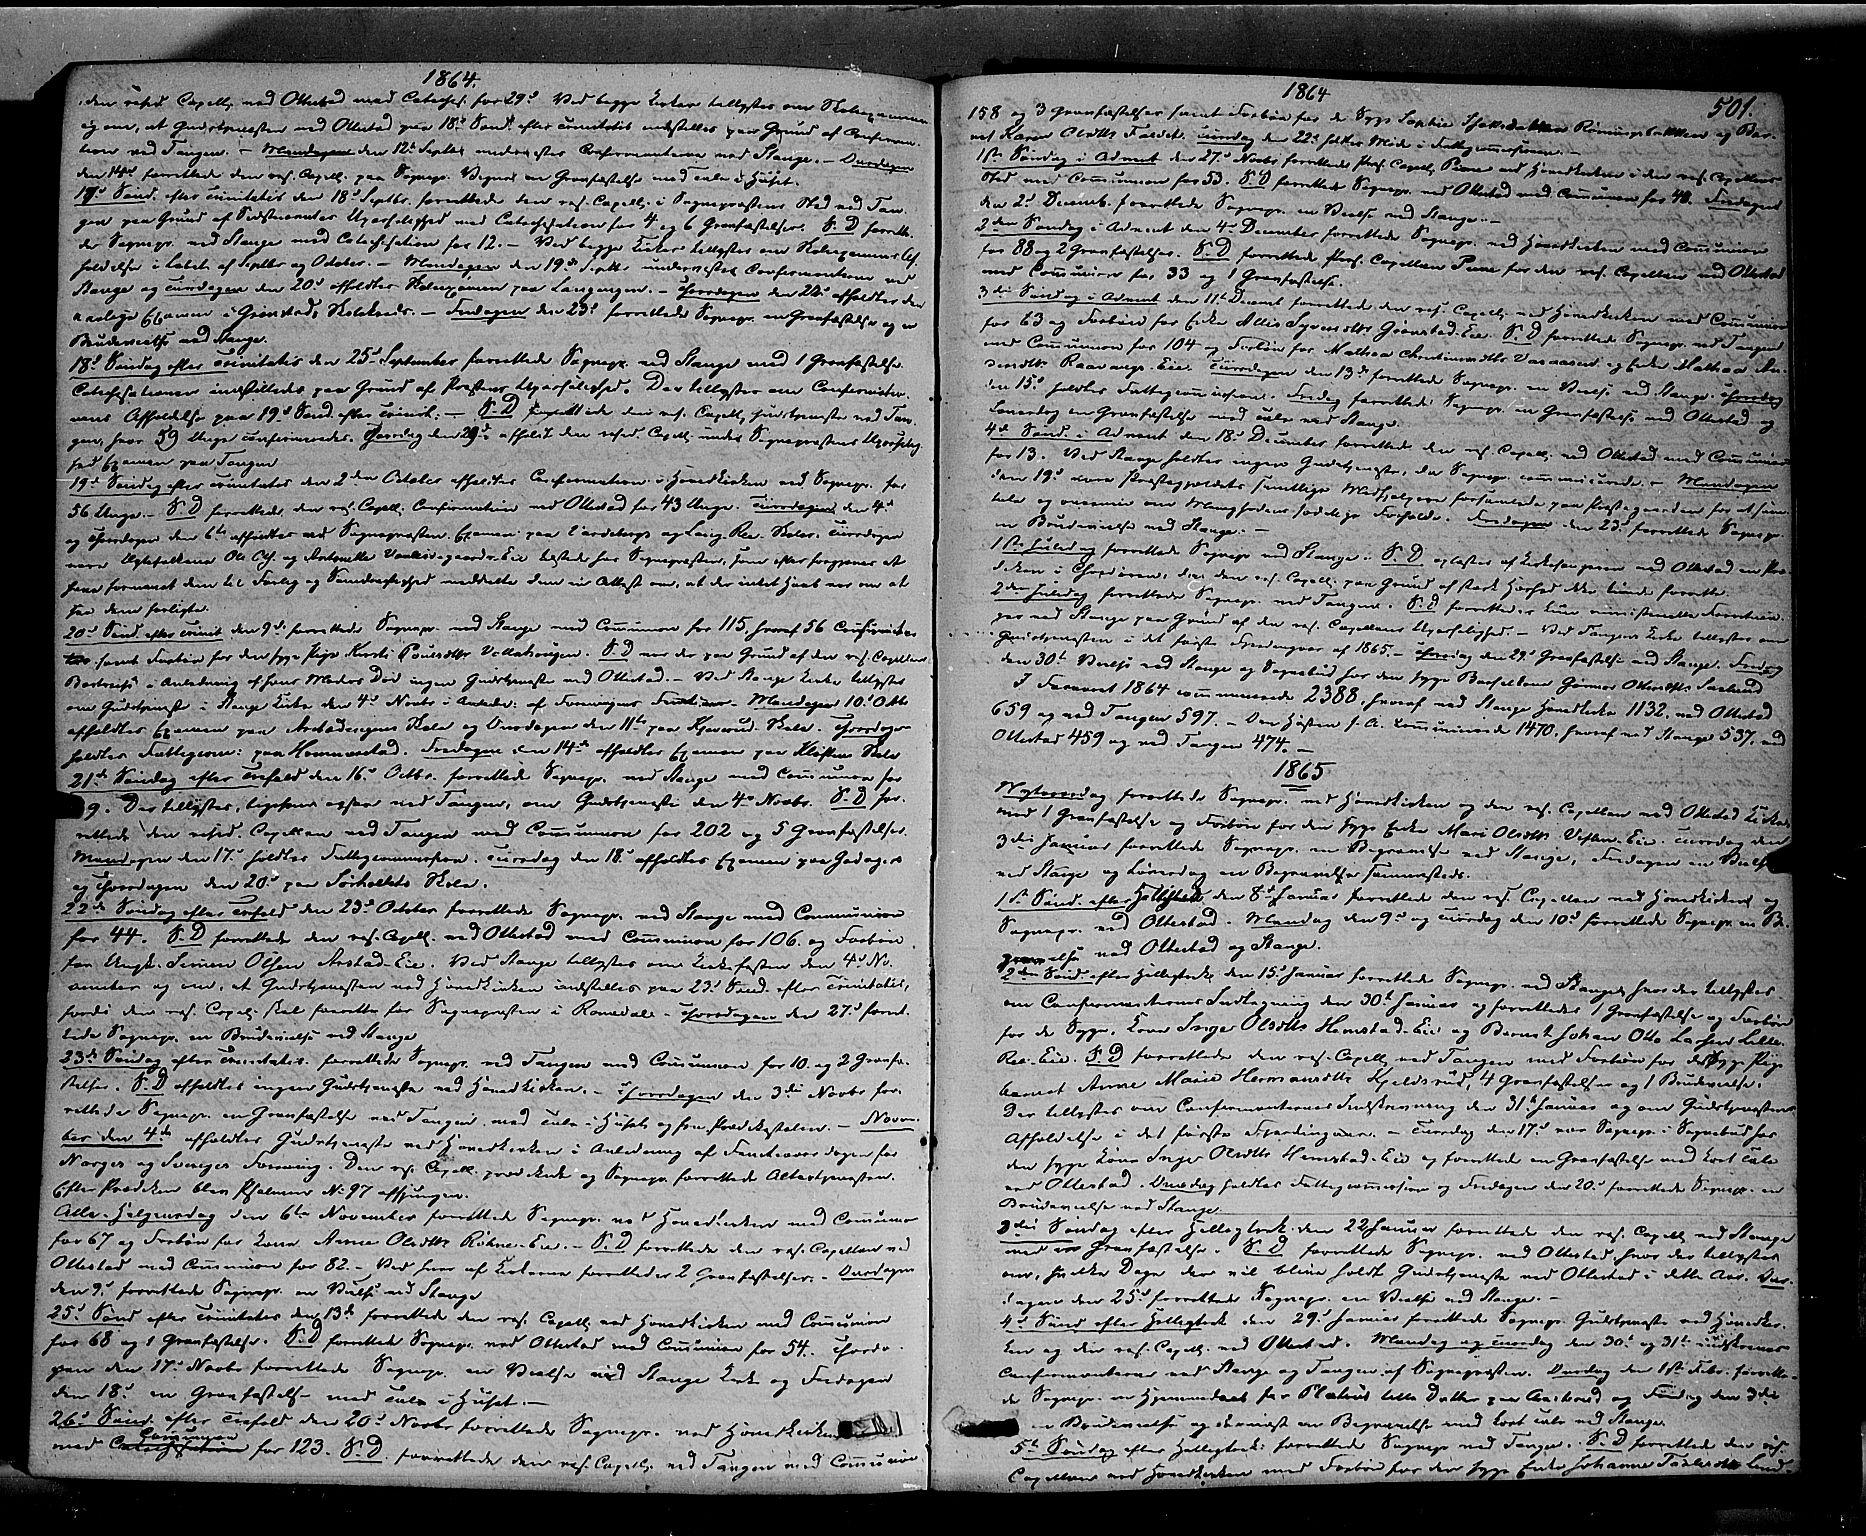 SAH, Stange prestekontor, K/L0013: Ministerialbok nr. 13, 1862-1879, s. 501